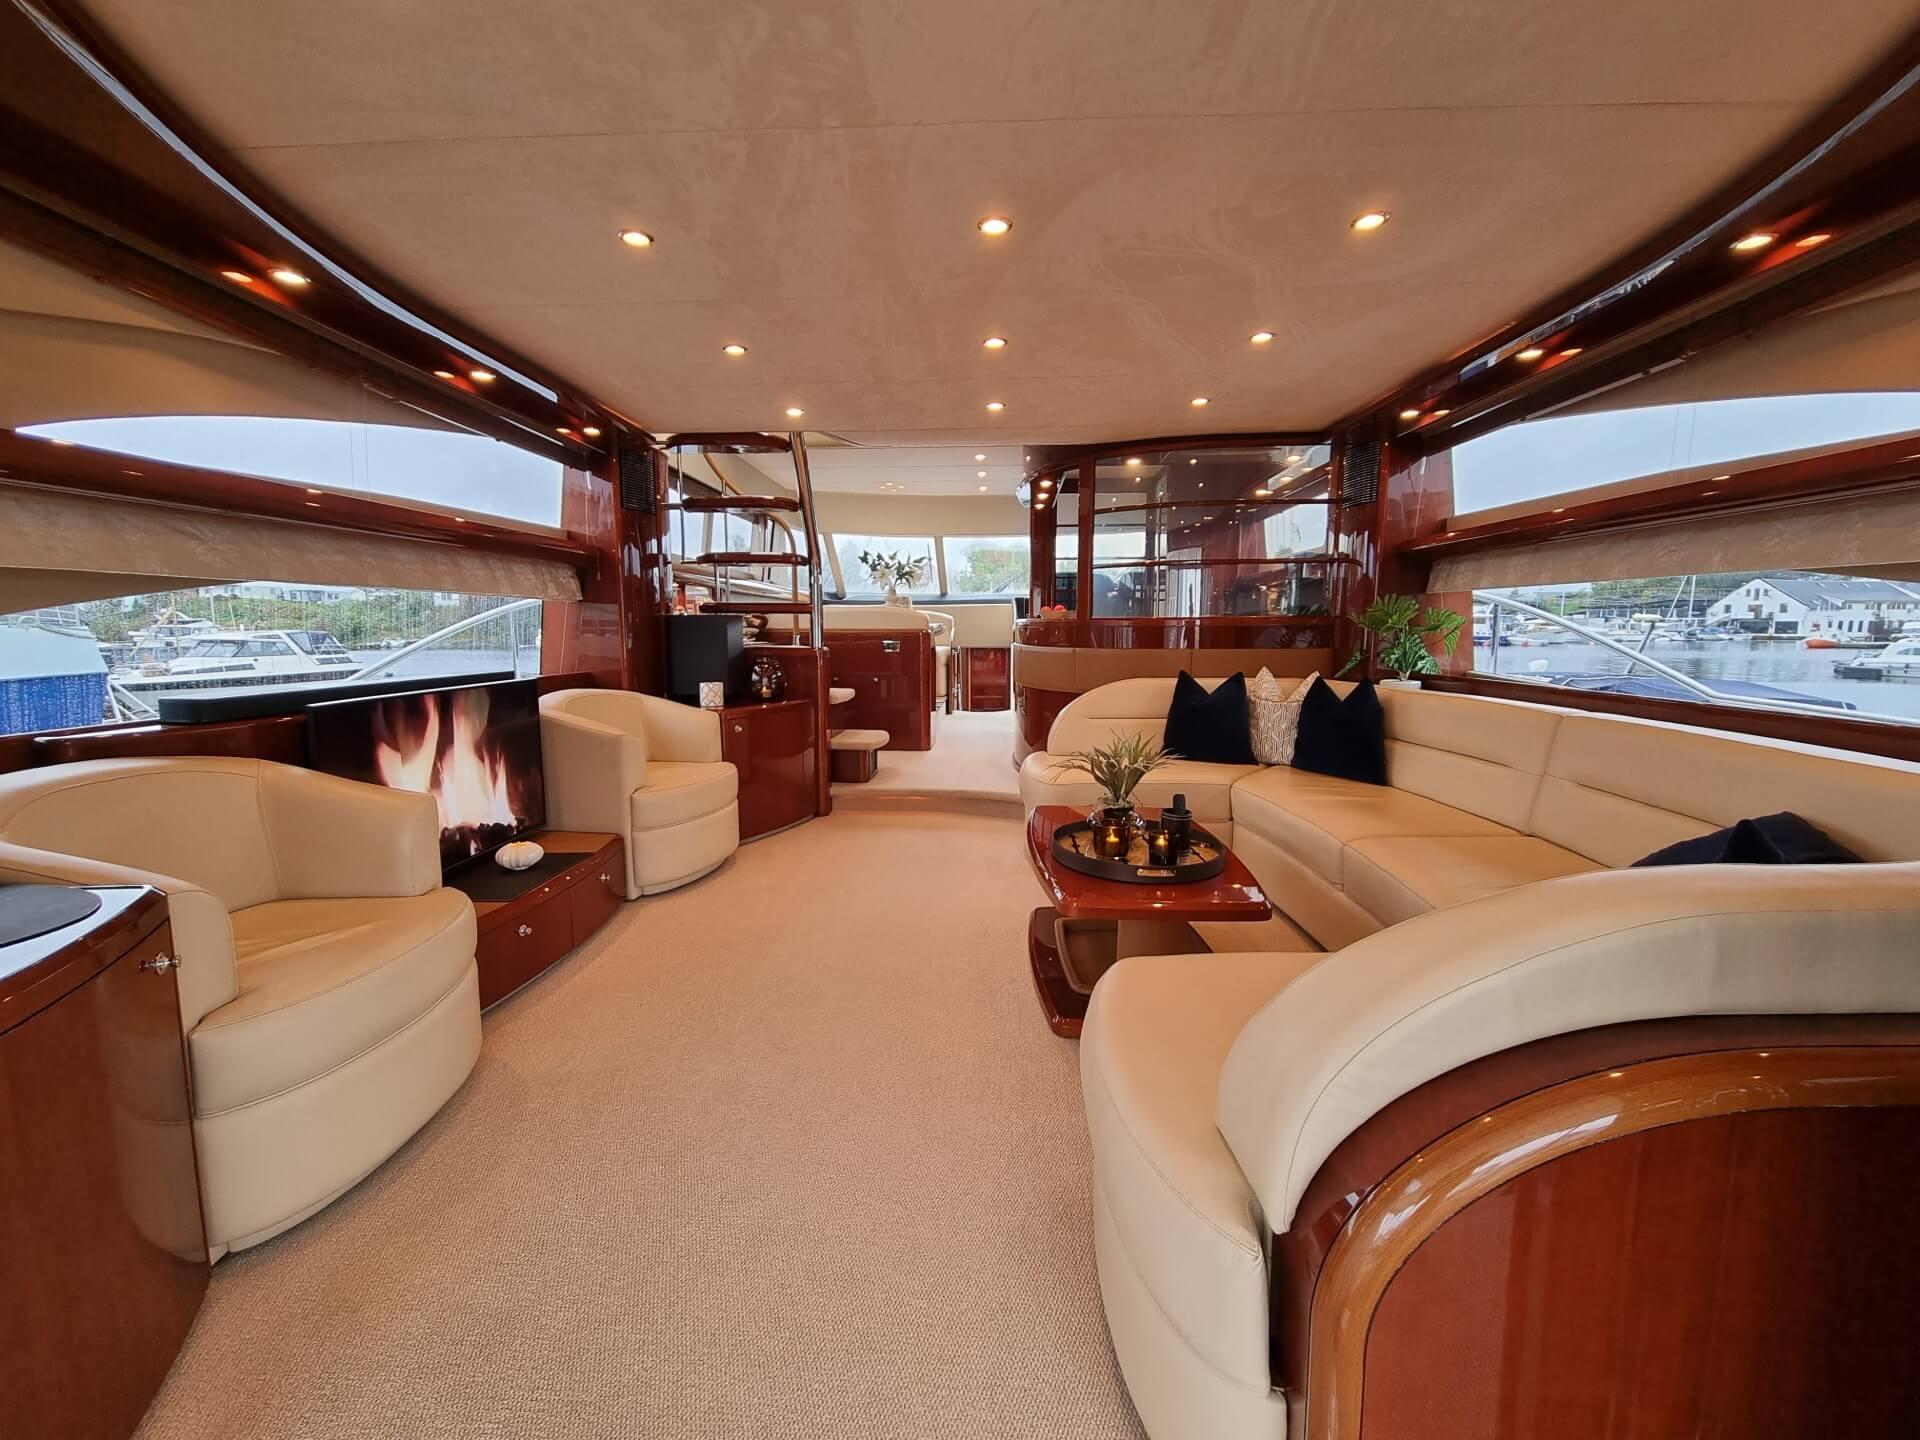 Flott interiør i BAROLO III - Private Cruise